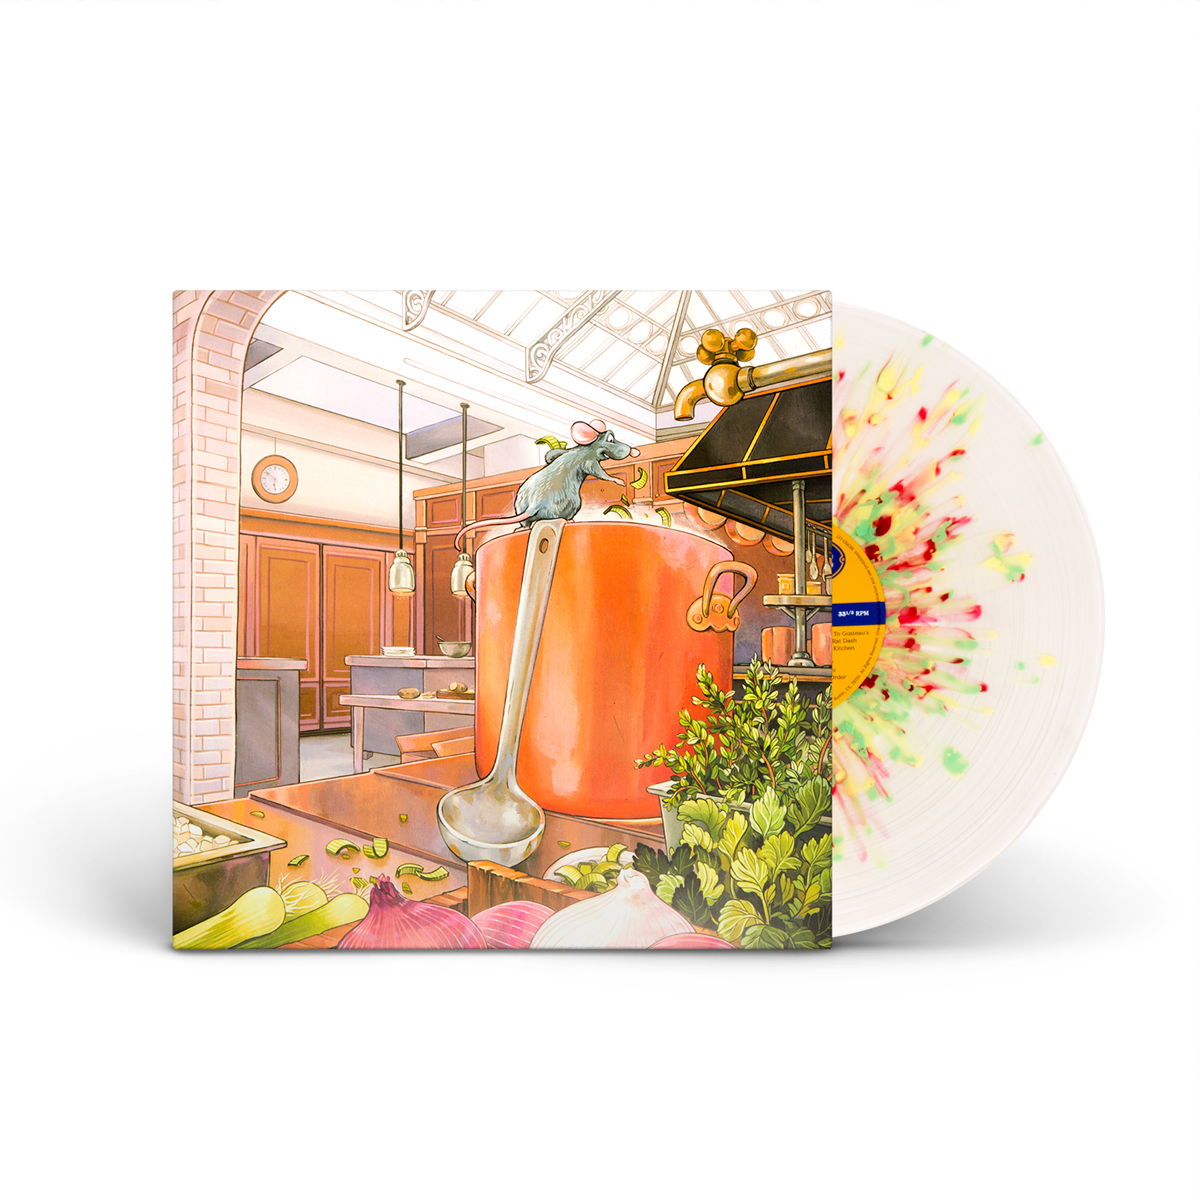 Ratatouille (Mondo Vinyl)